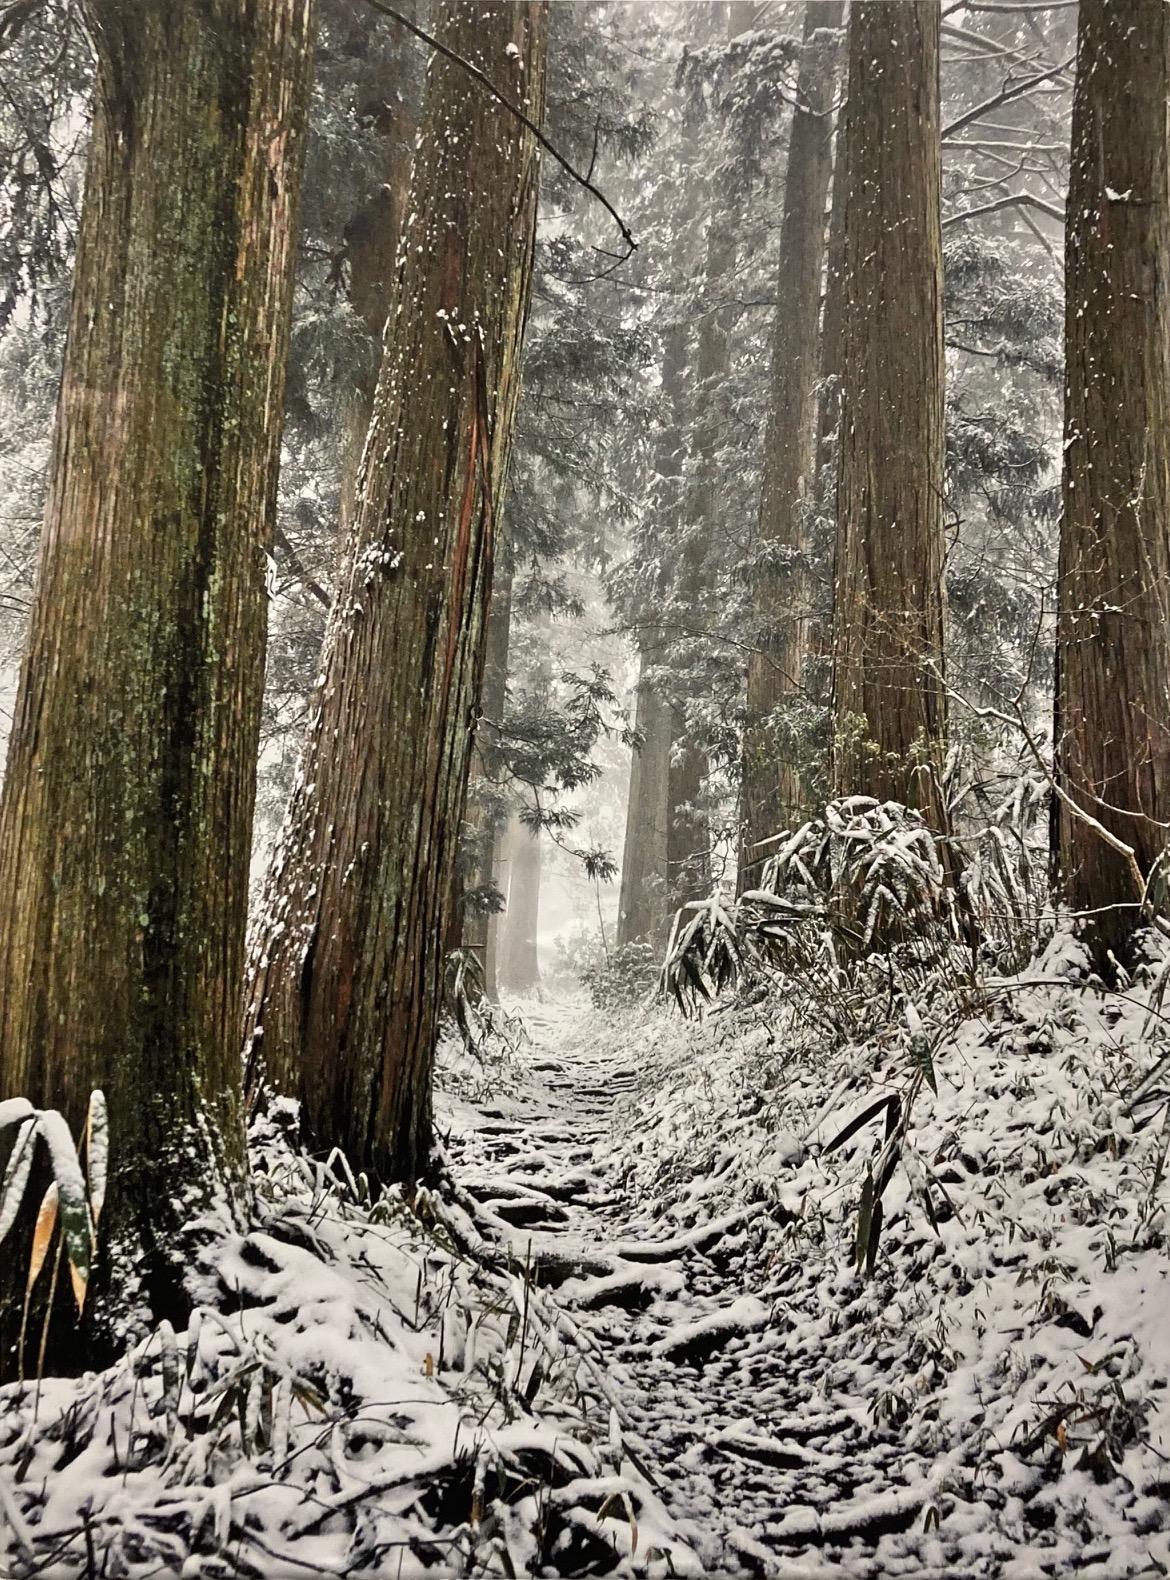 Ted Prato  -  Snowy Path  -  photograph  -  $170.00